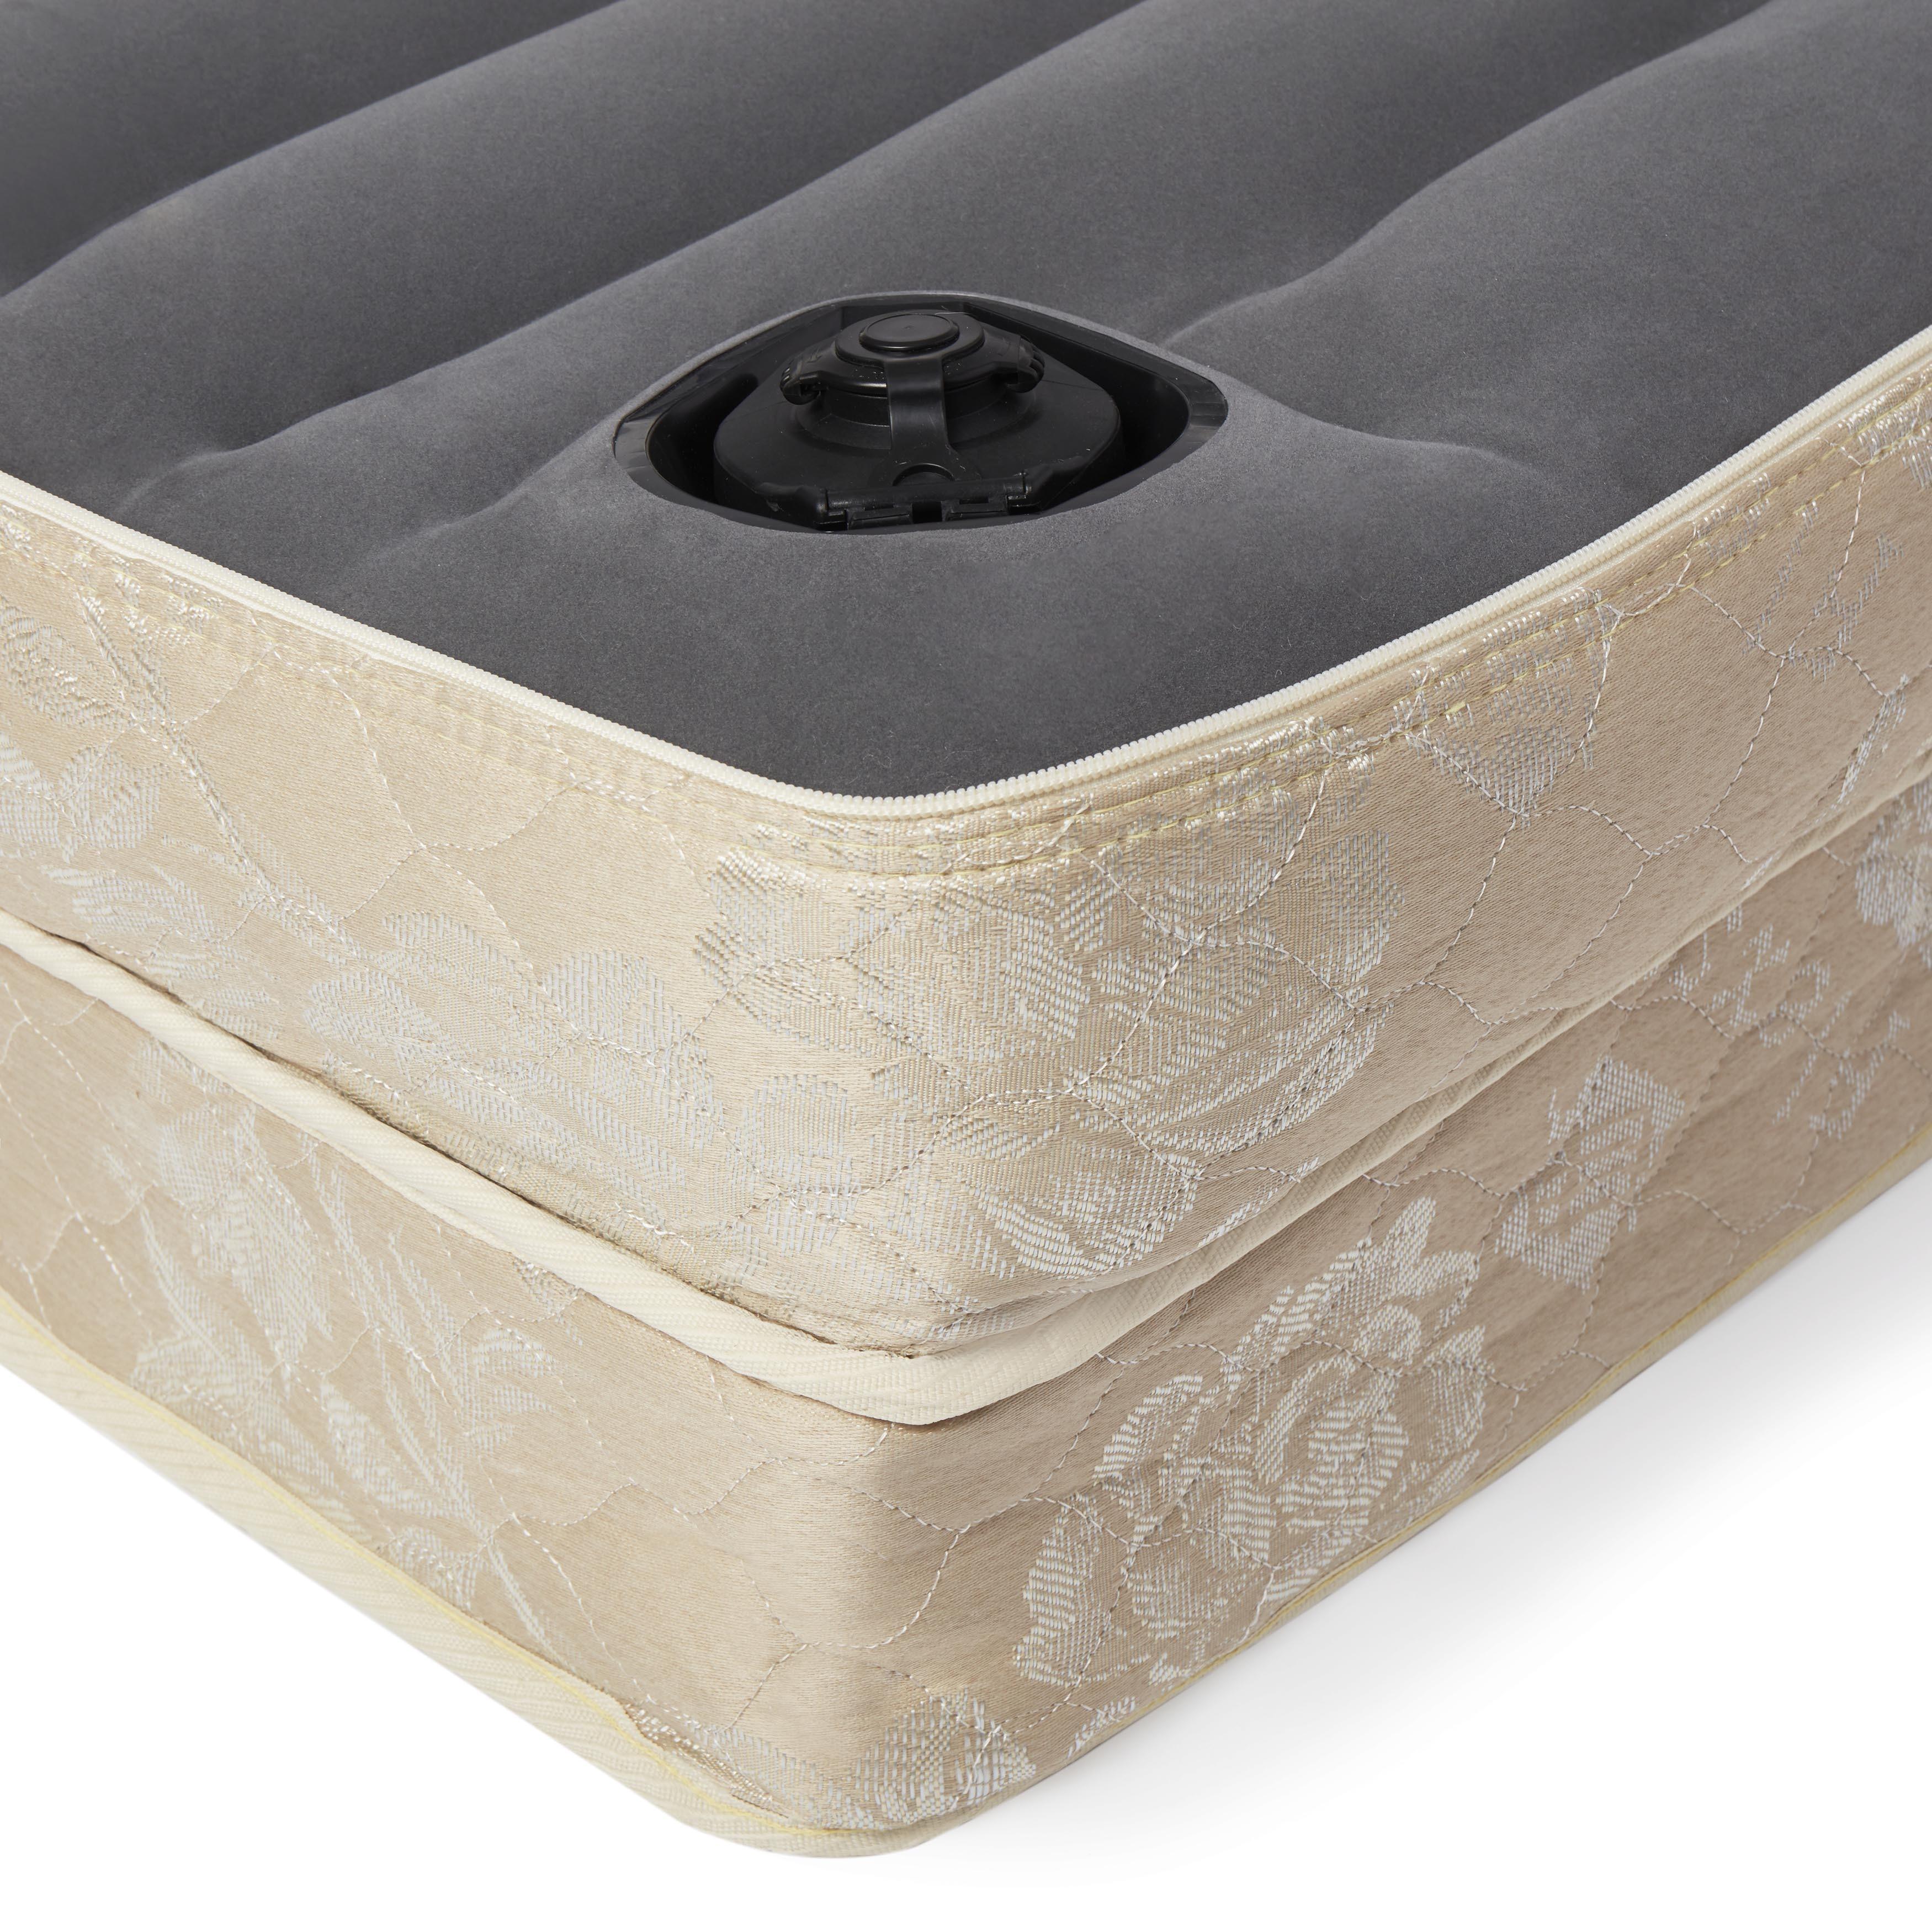 Airdream Sofa Bed Mattress Airdream Sleeper Sofa Bed